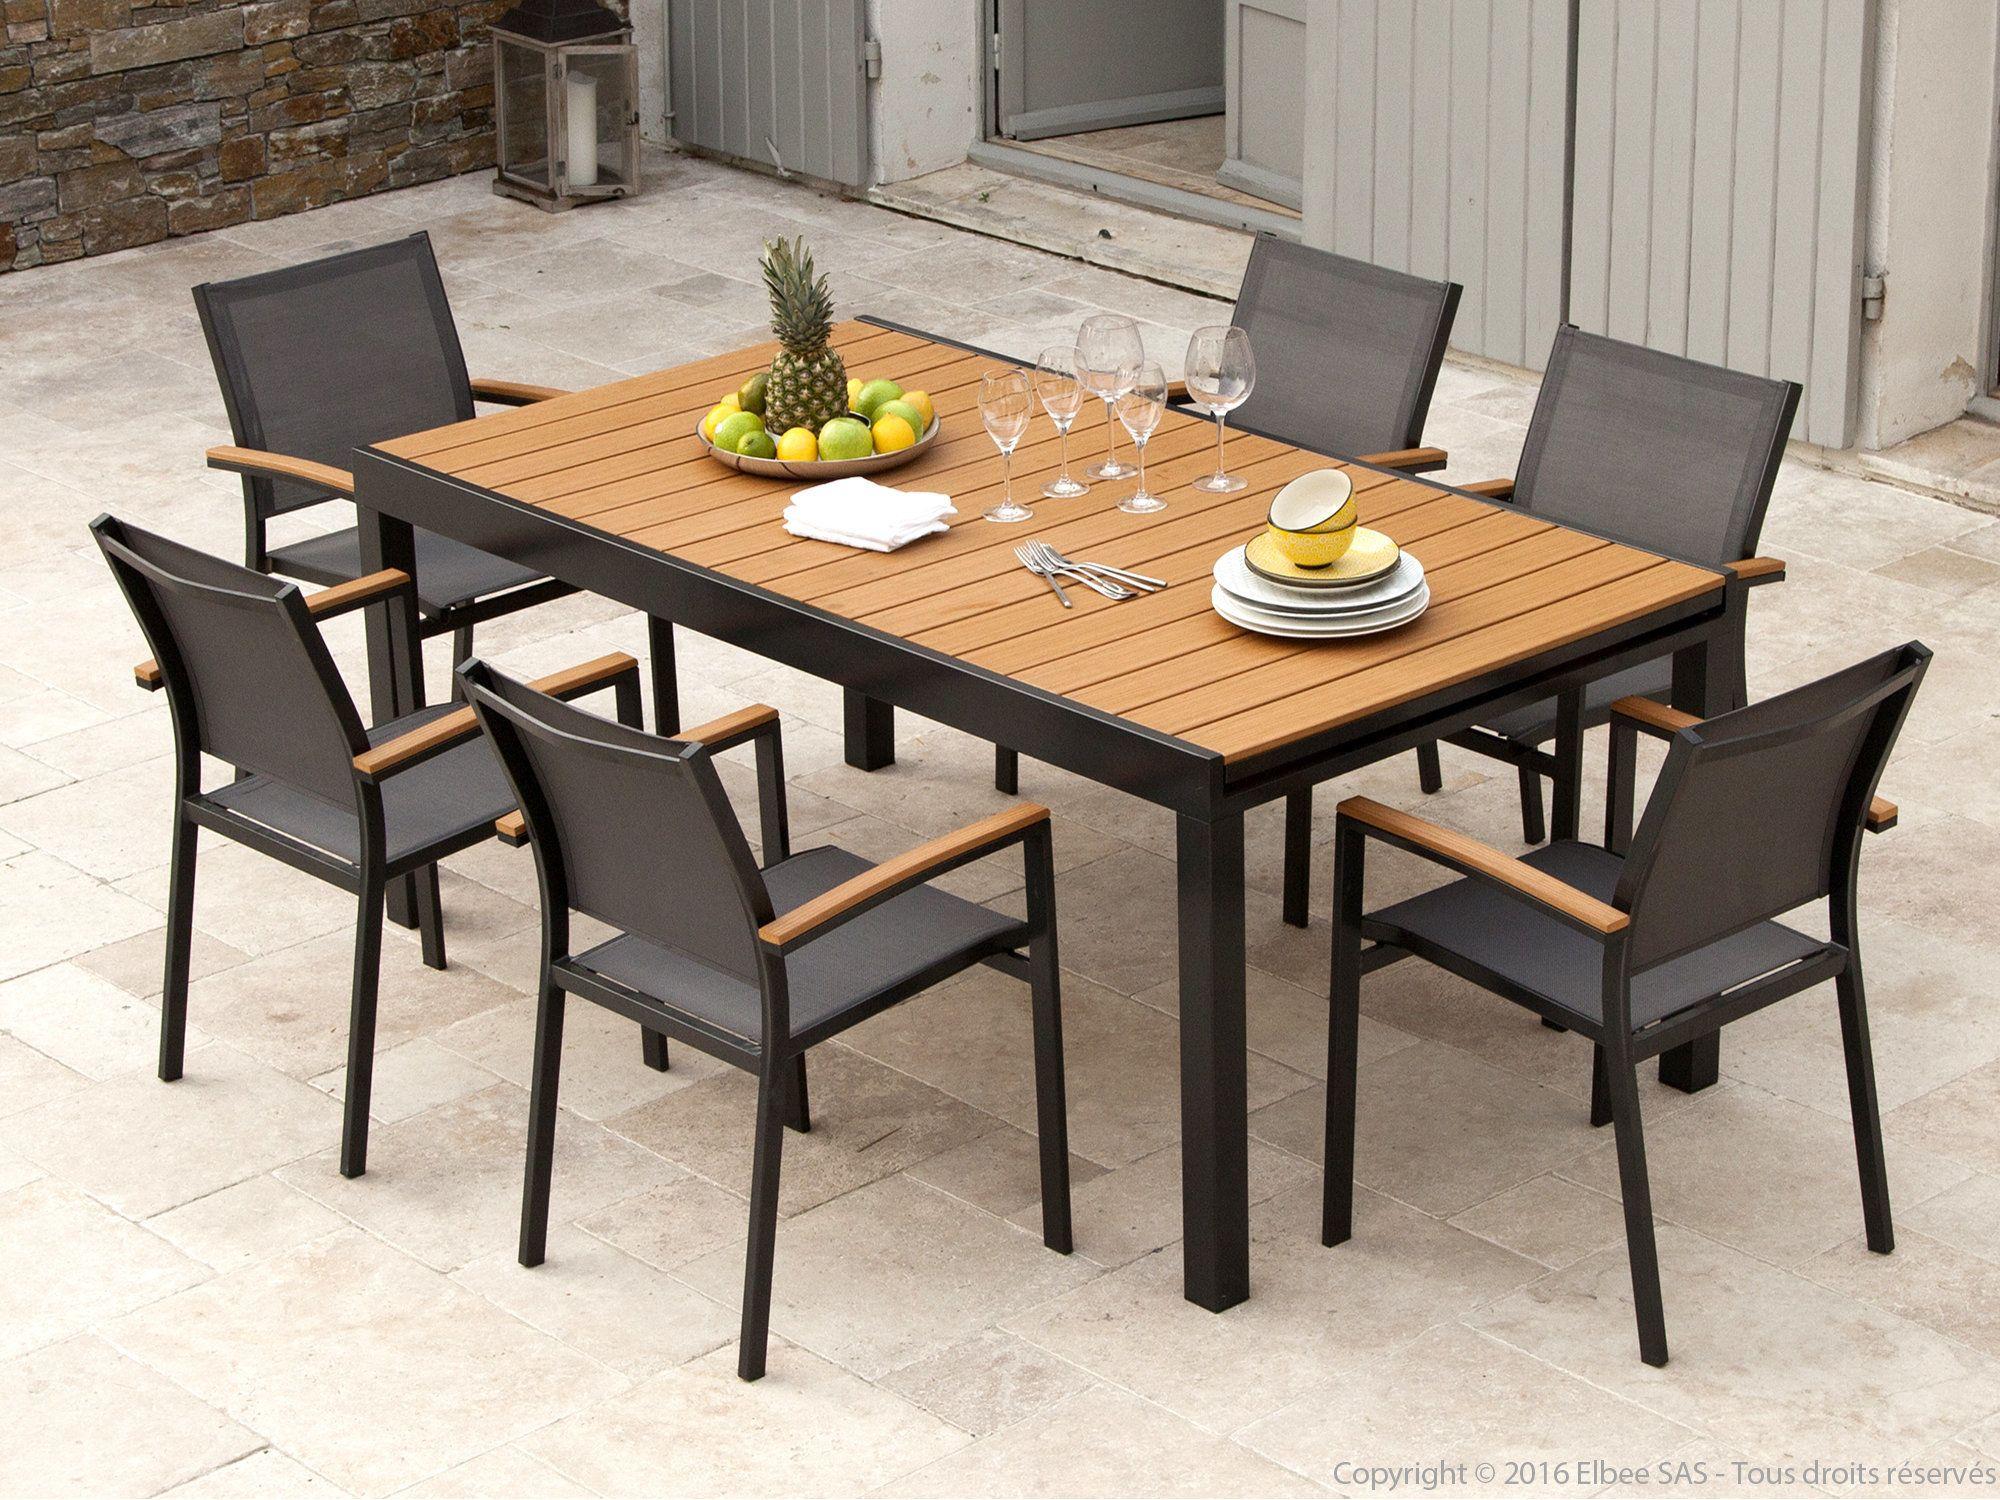 Impressionnant Table De Salon De Jardin En Bois | Mesas ... serapportantà Table De Jardin En Alu